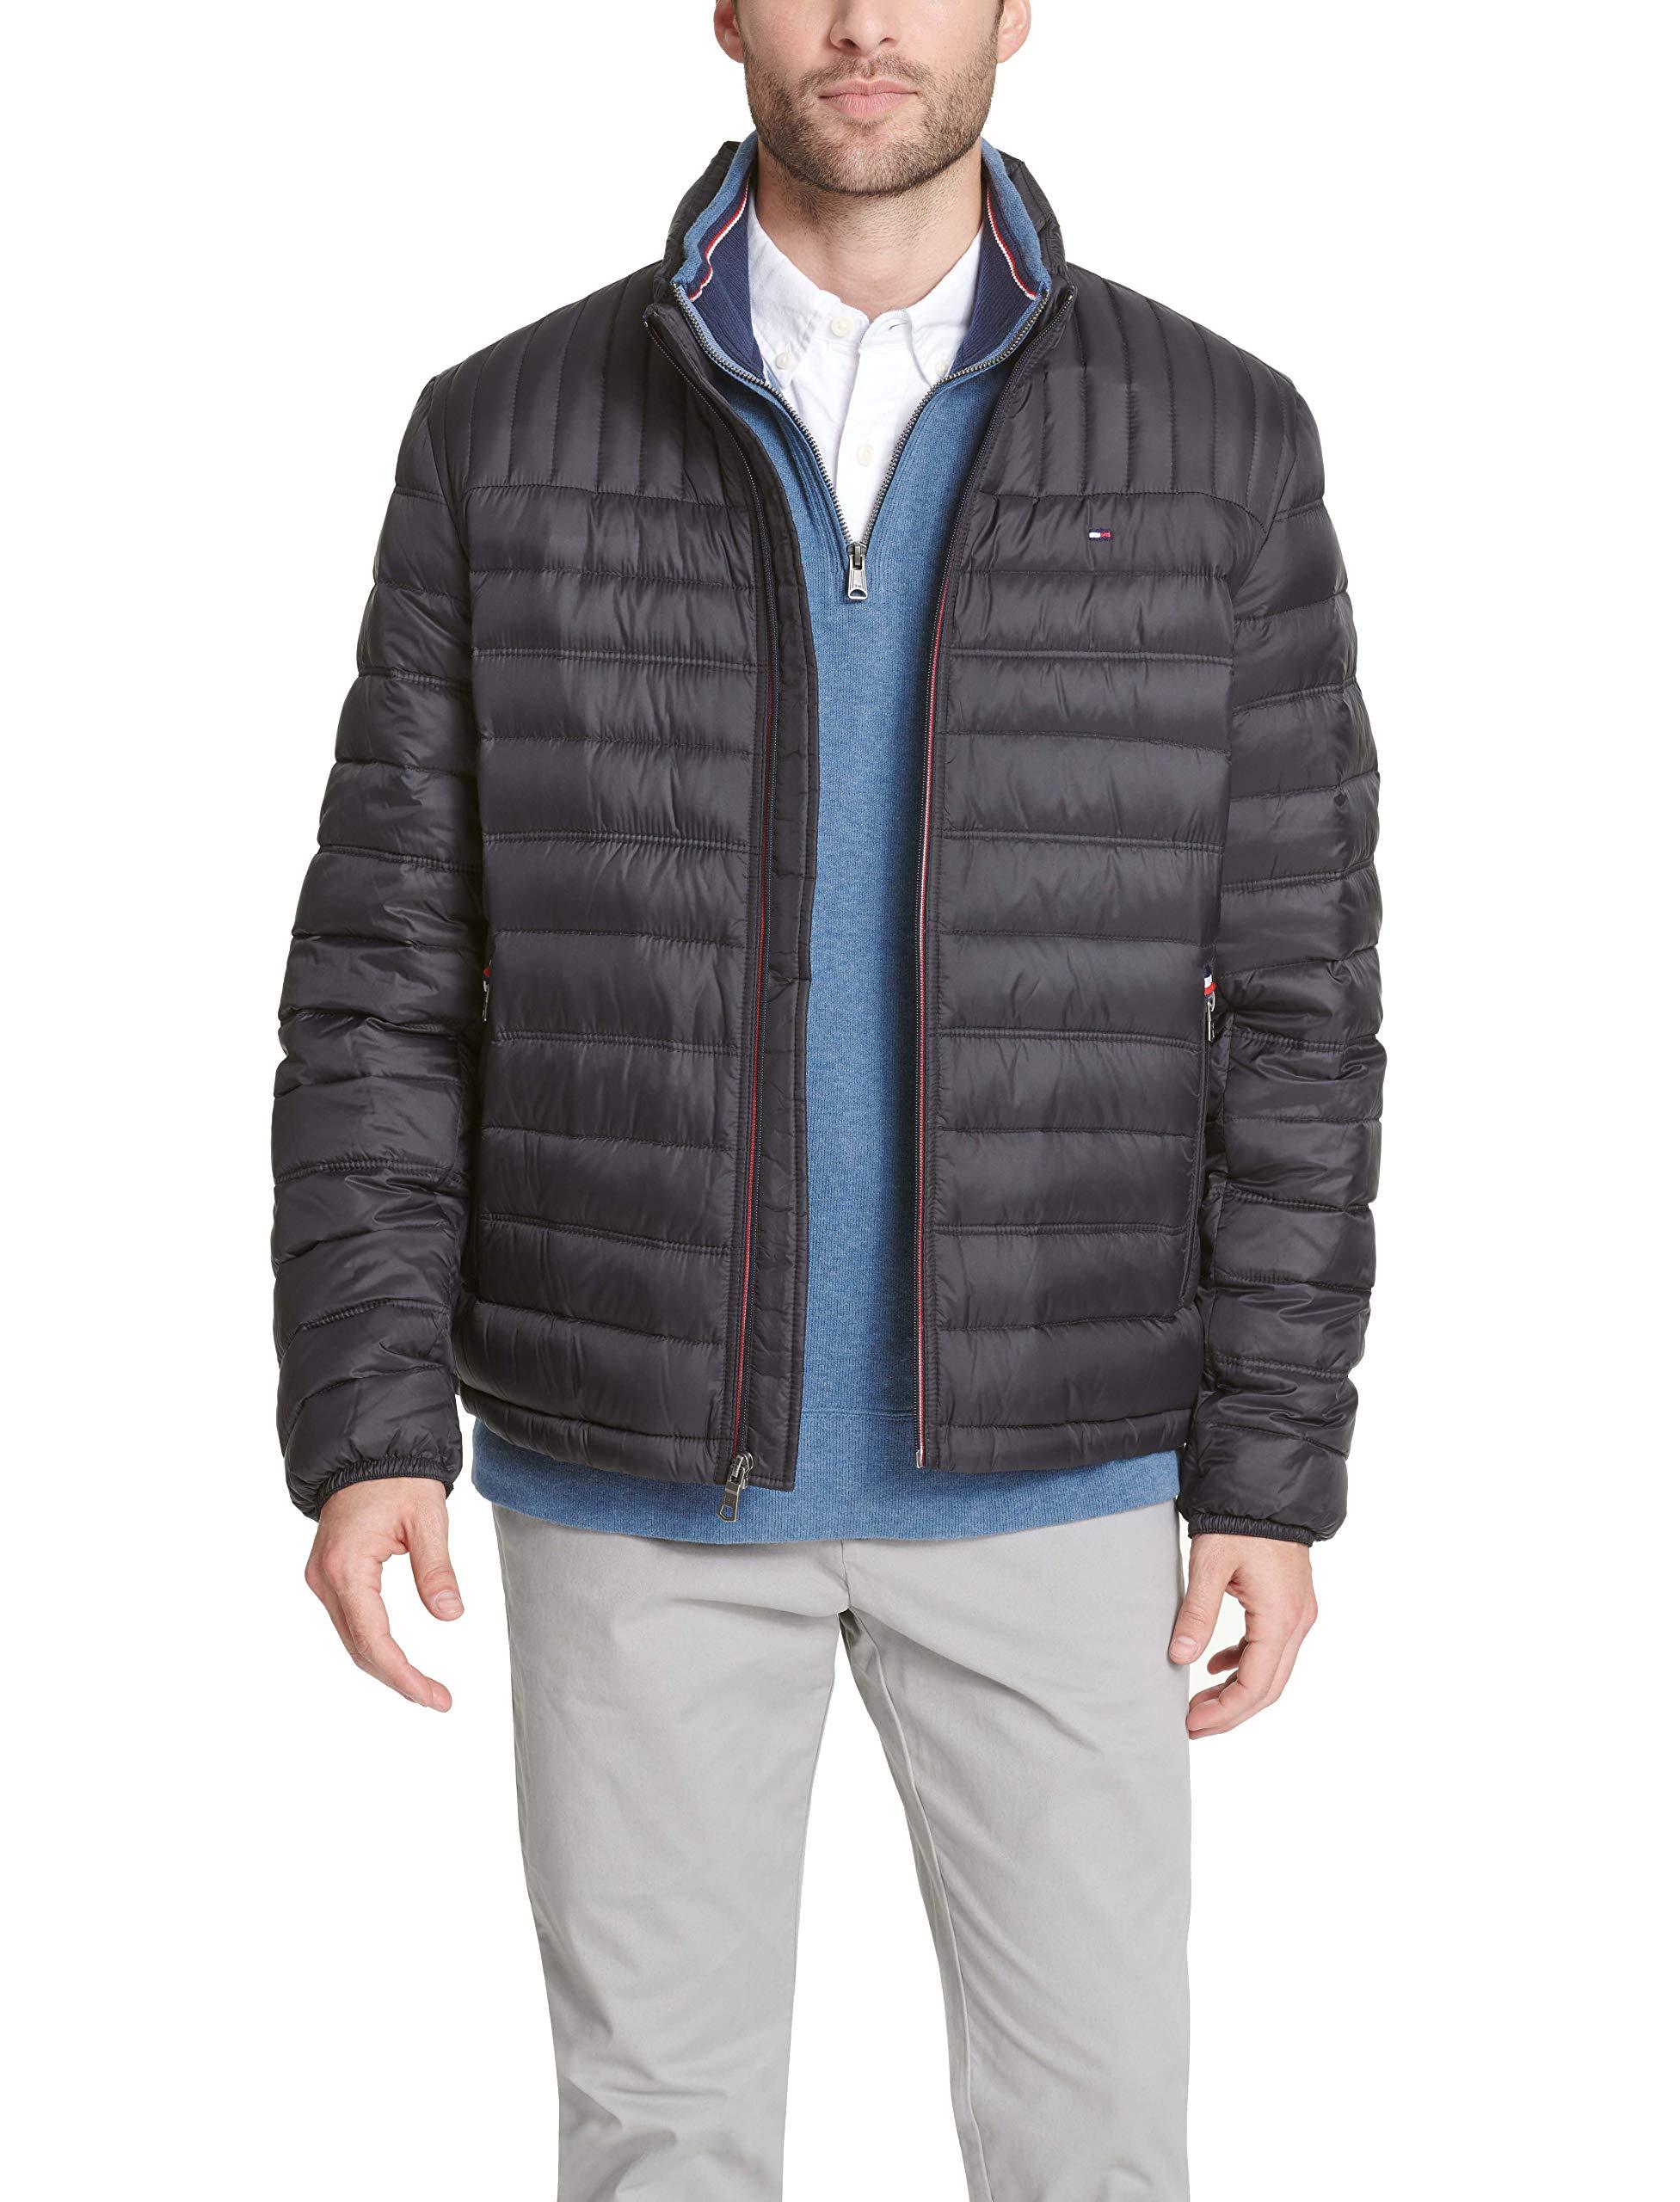 Tommy Hilfiger Men's Ultra Loft Packable Puffer Jacket, Black, Medium